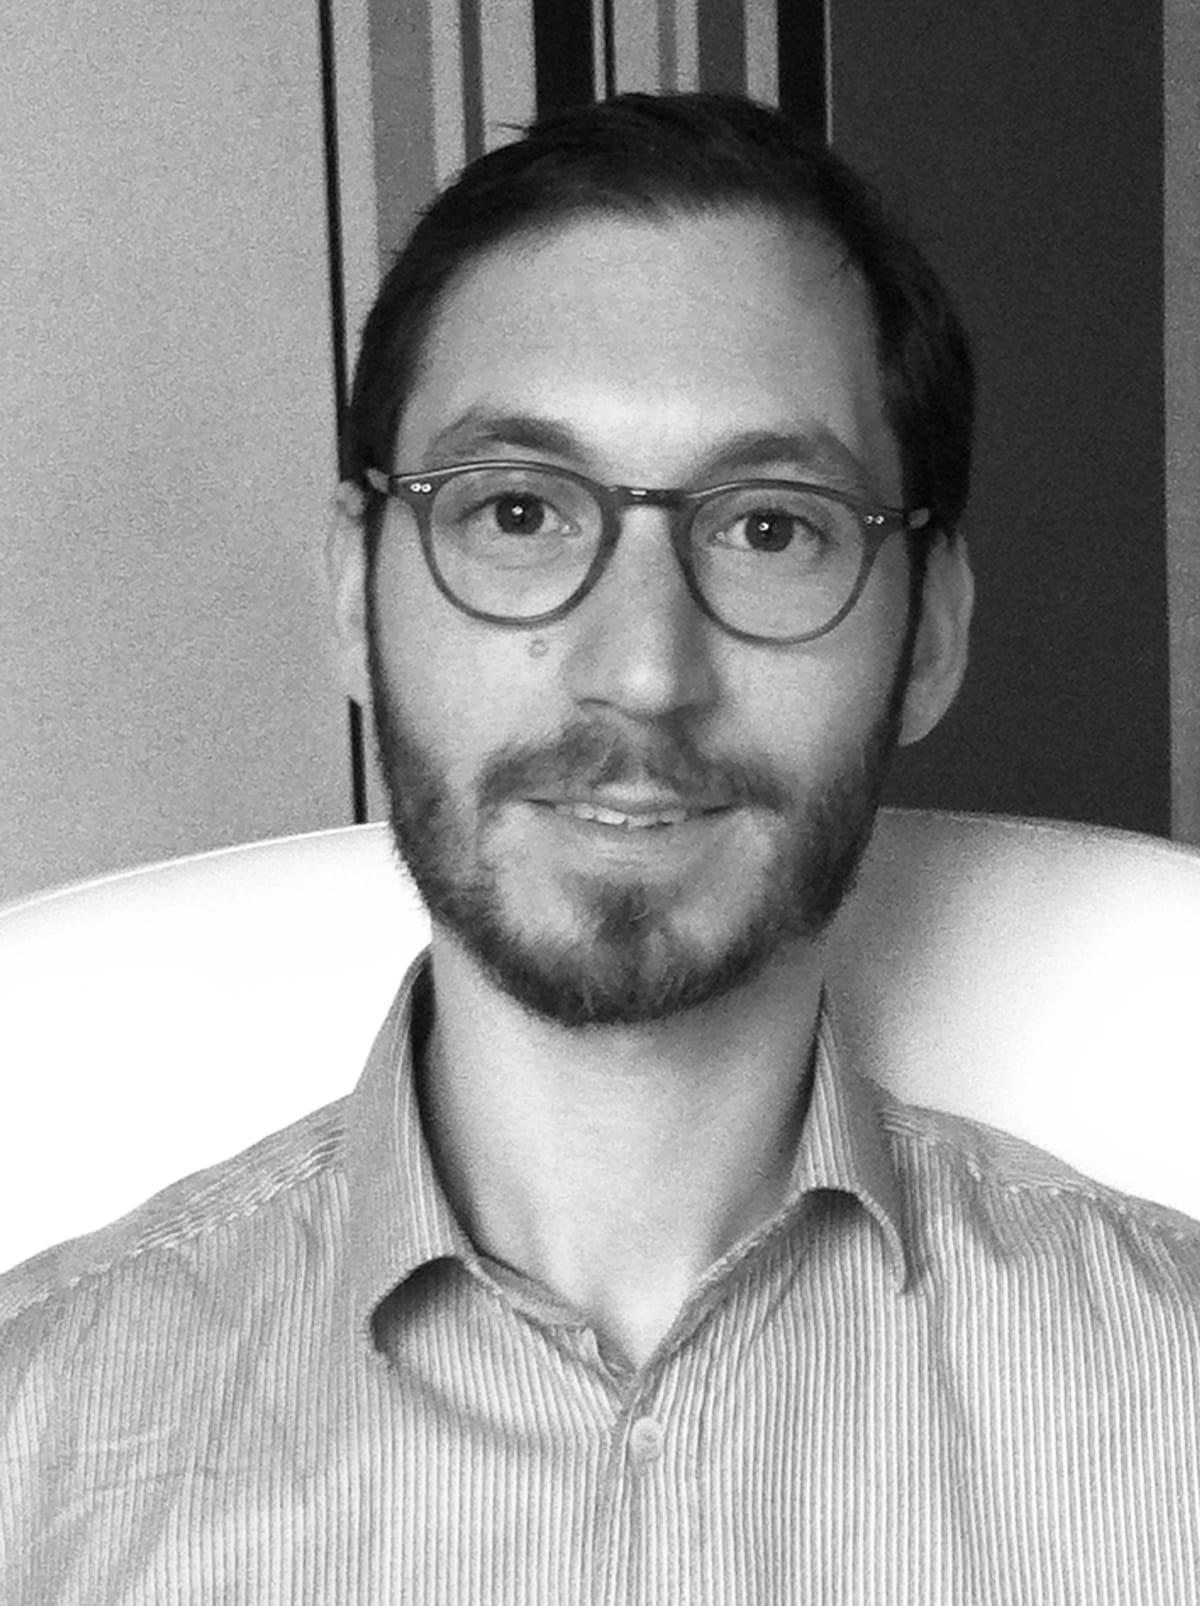 Daniel from Strasbourg